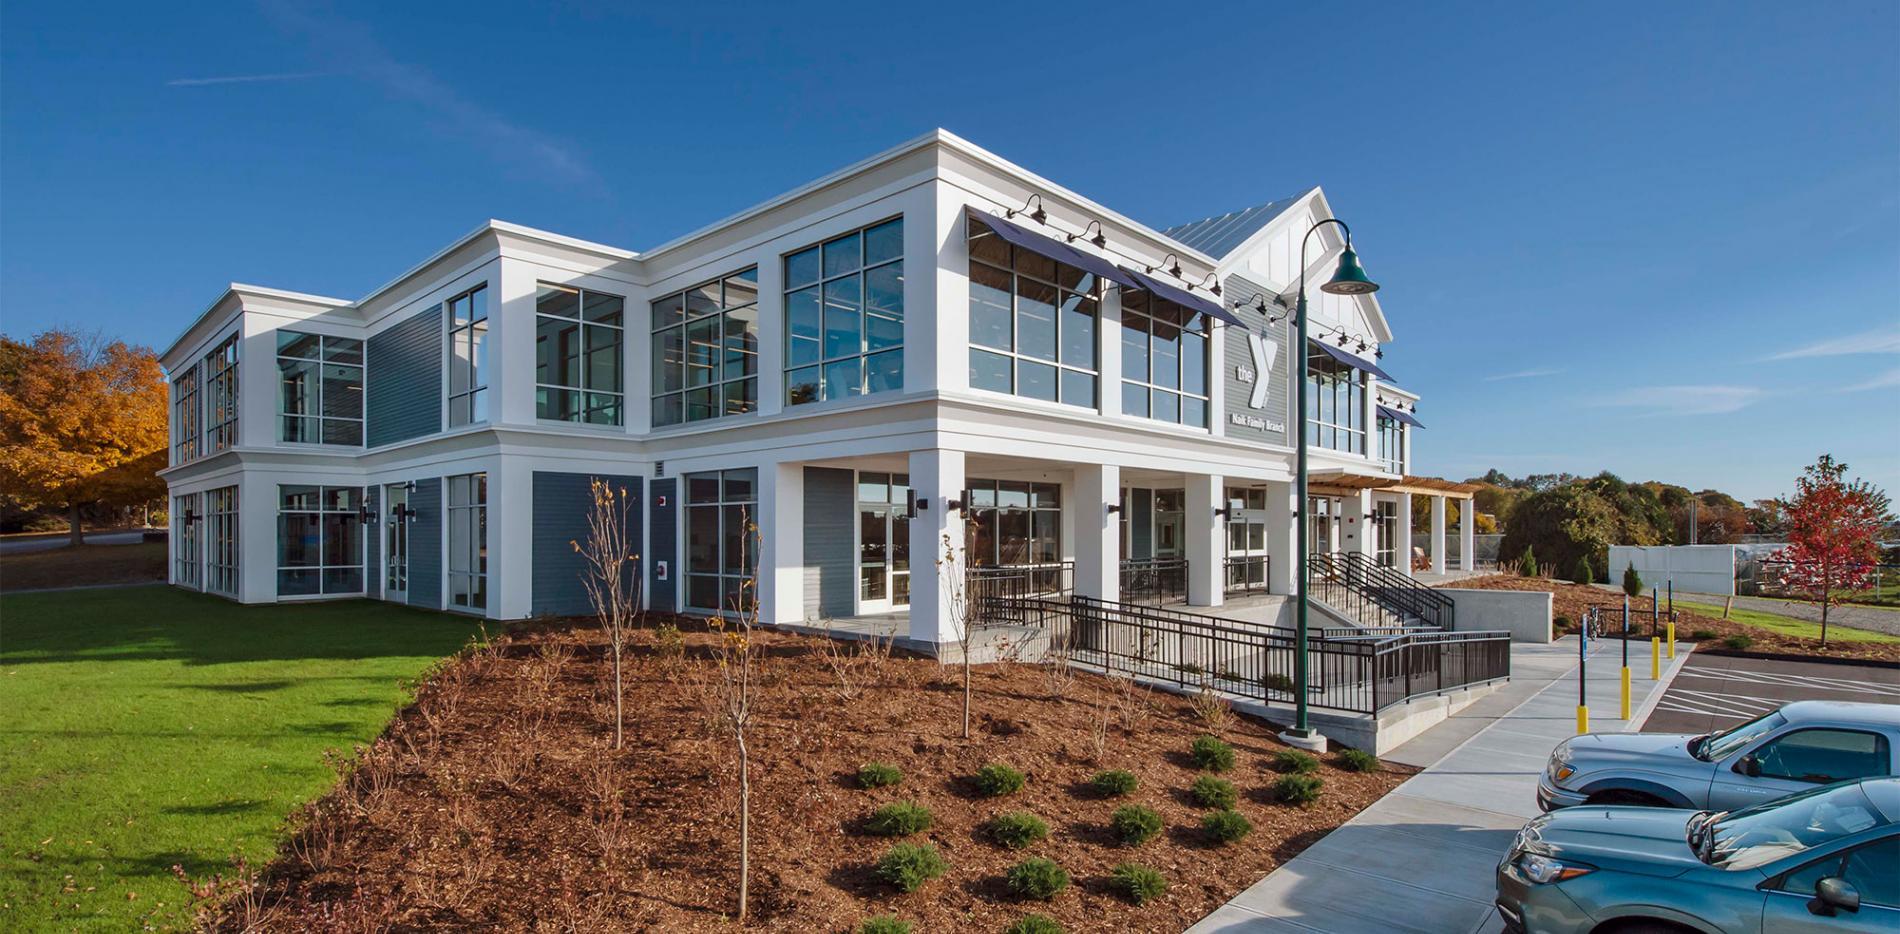 Ocean Community YMCA building